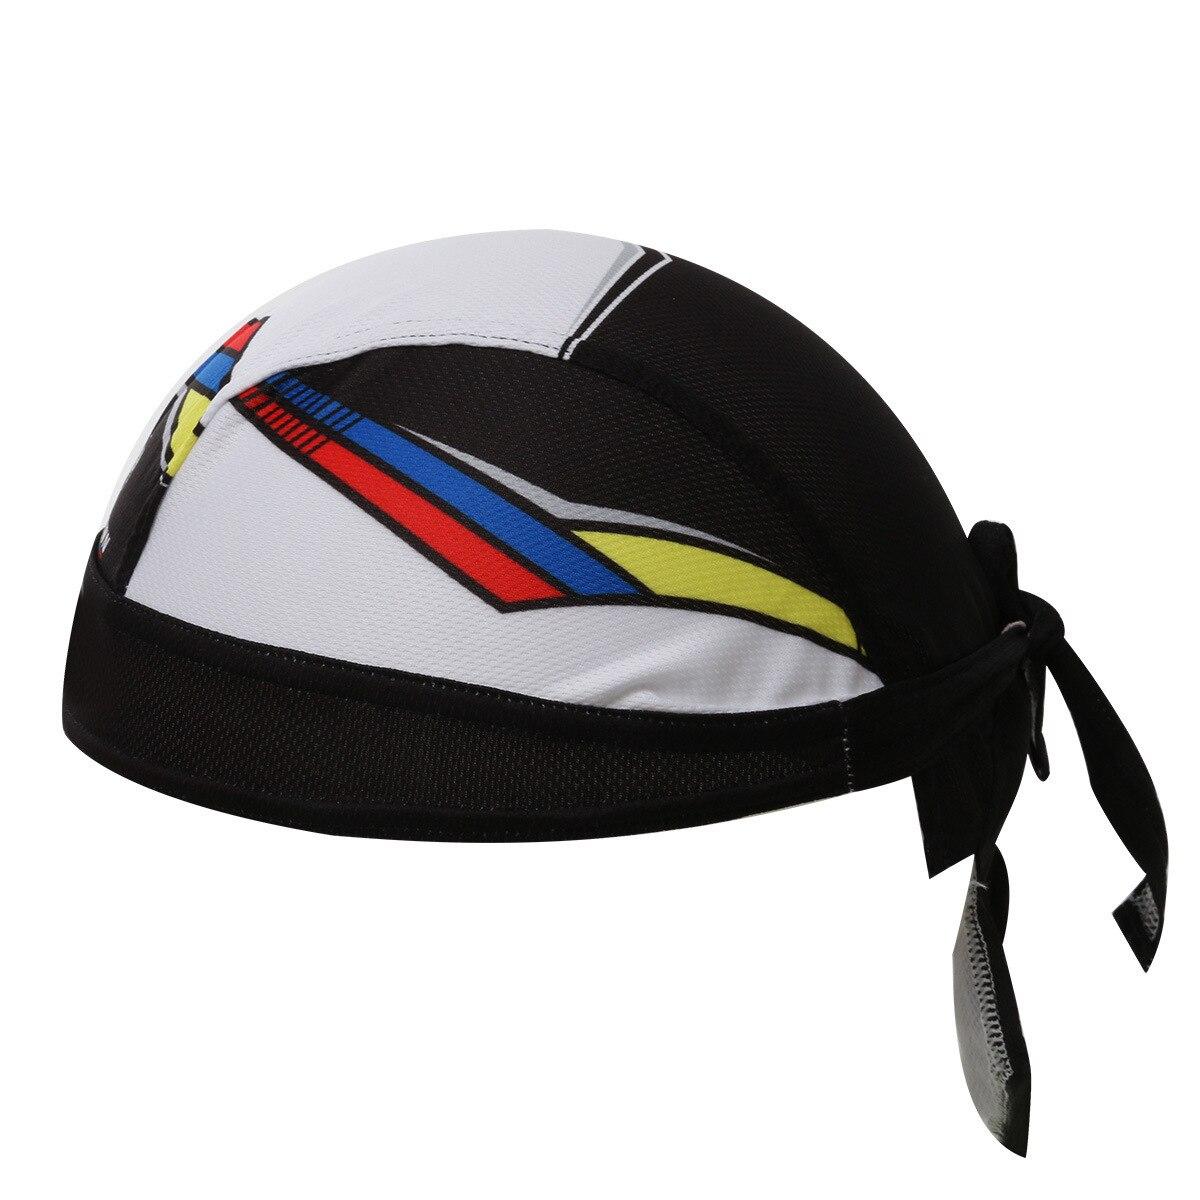 Black White Cycling Hat Cap Pirate Head Scarf Road MTB Bike Bicycle Headband Sweatproof Racing Riding Ciclismo Bandana Headwear